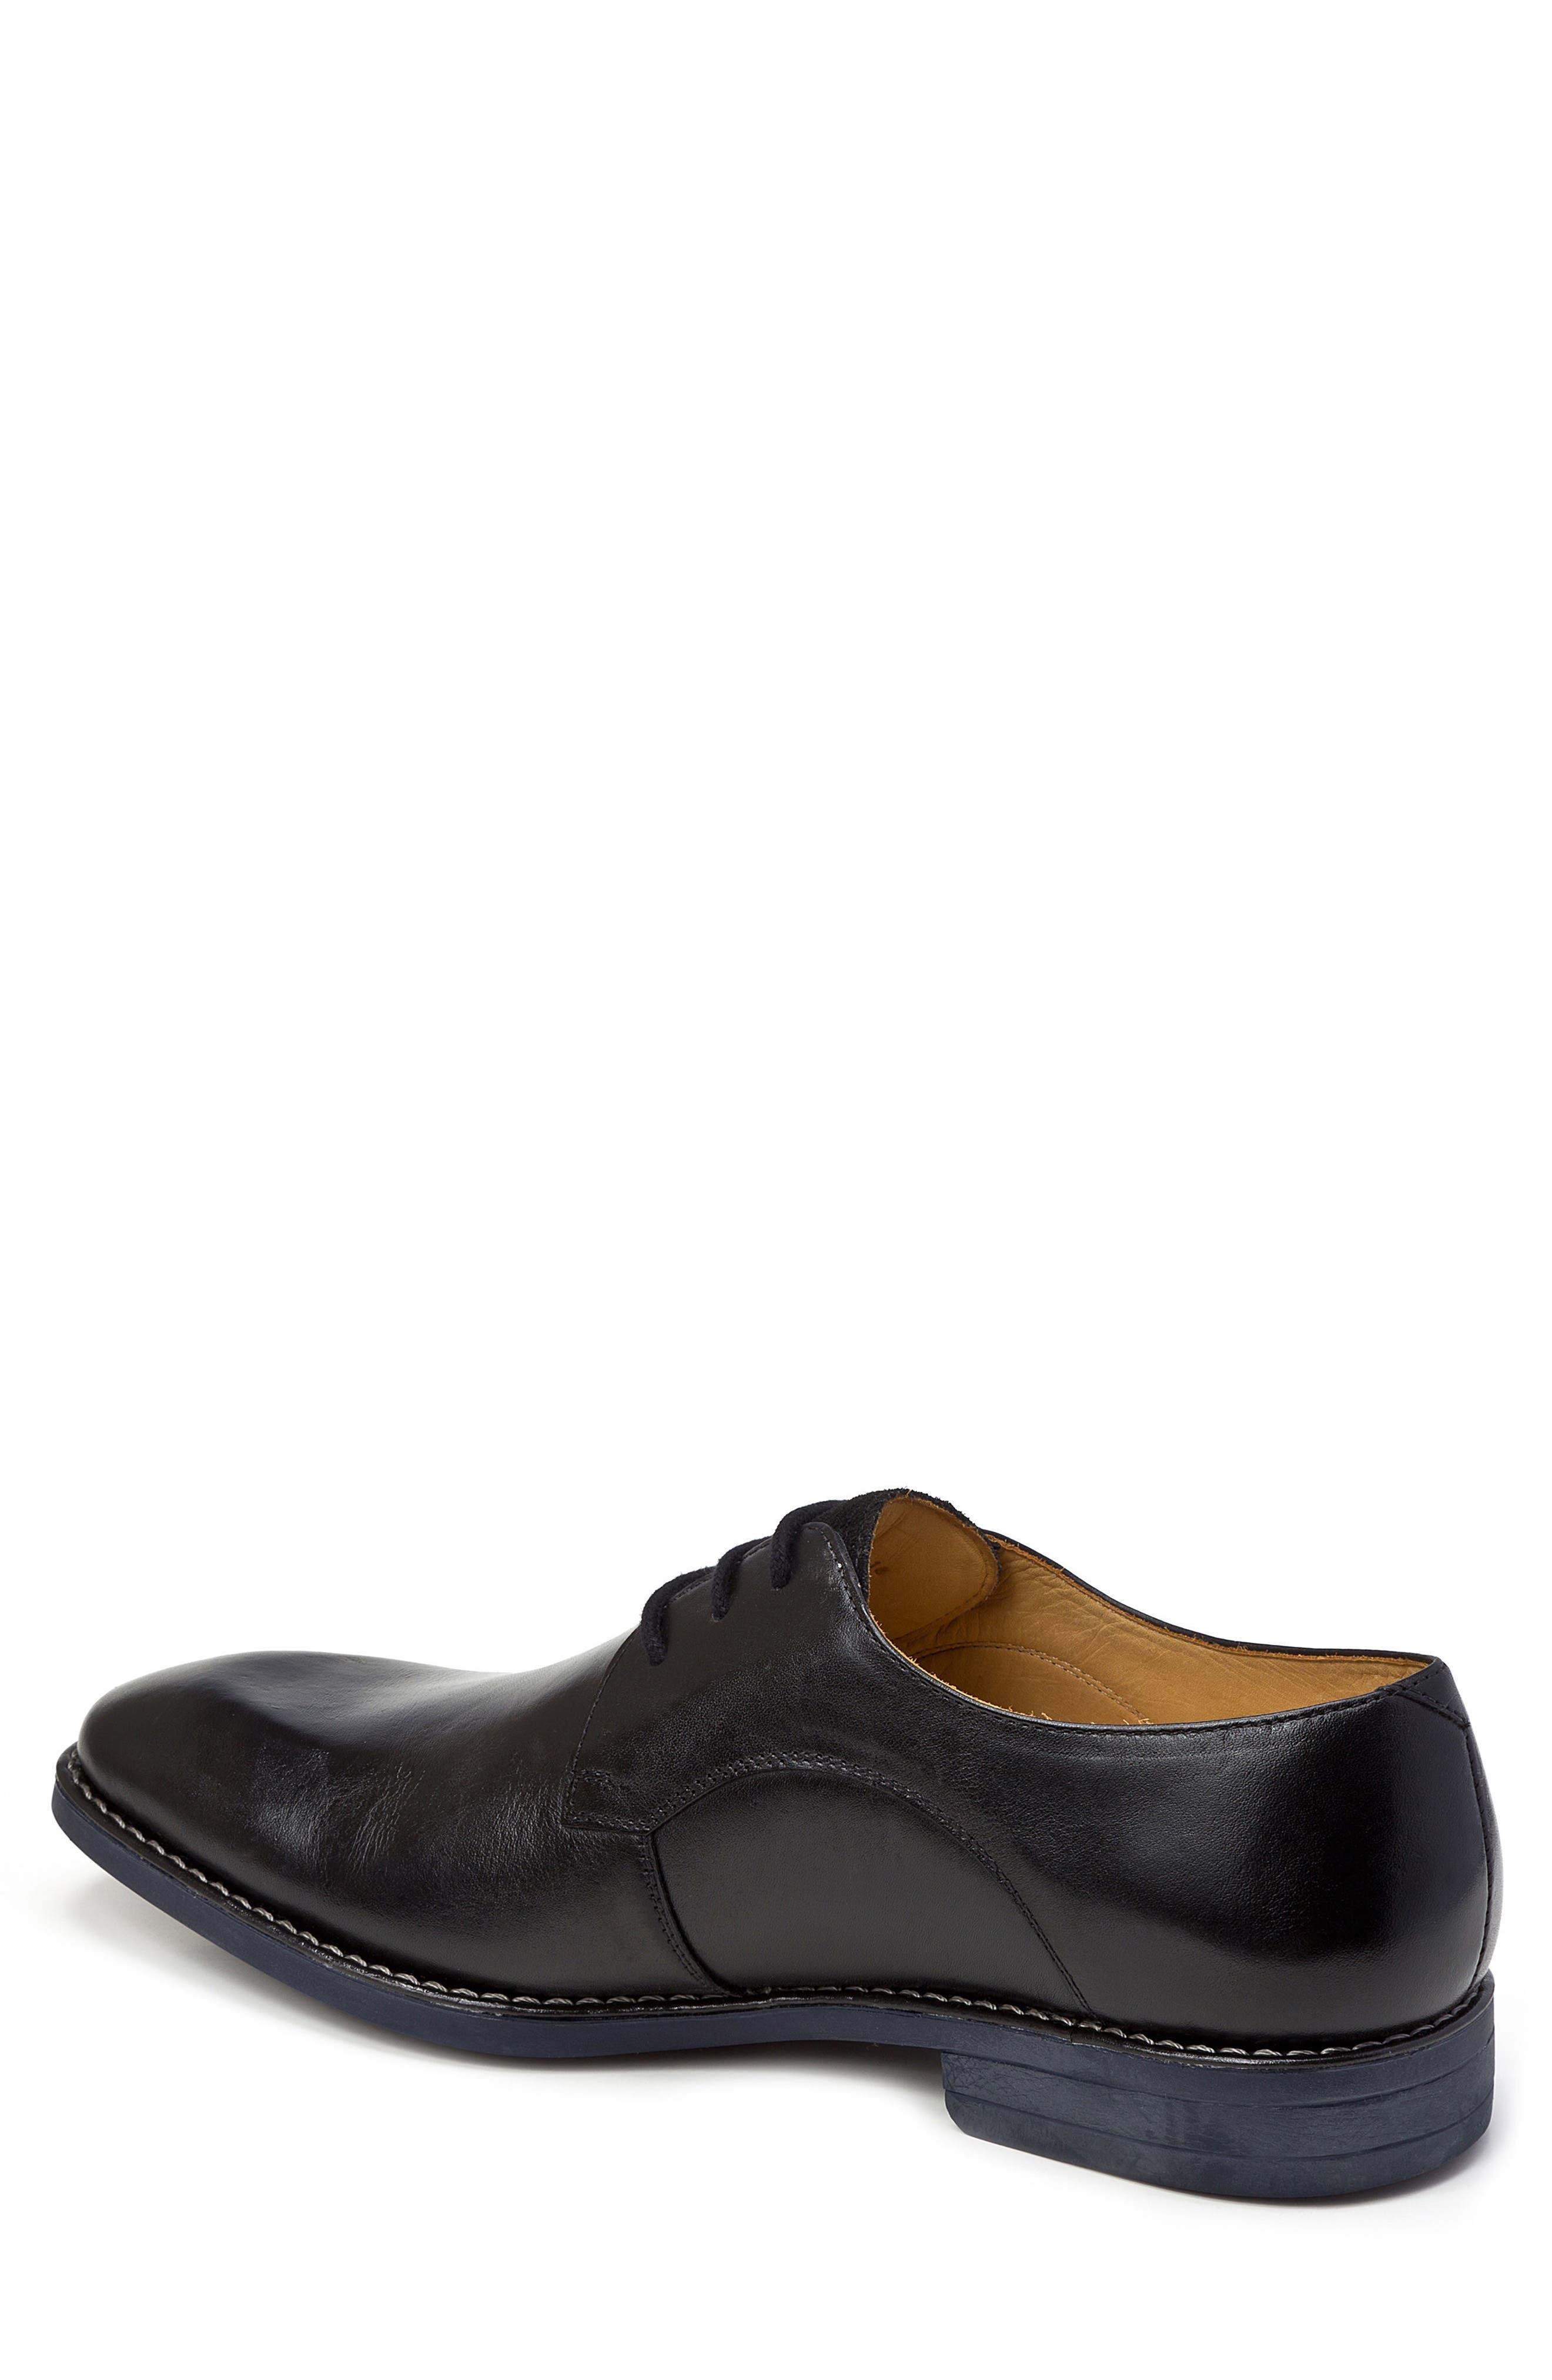 Garret Plain Toe Derby,                             Alternate thumbnail 2, color,                             BLACK LEATHER